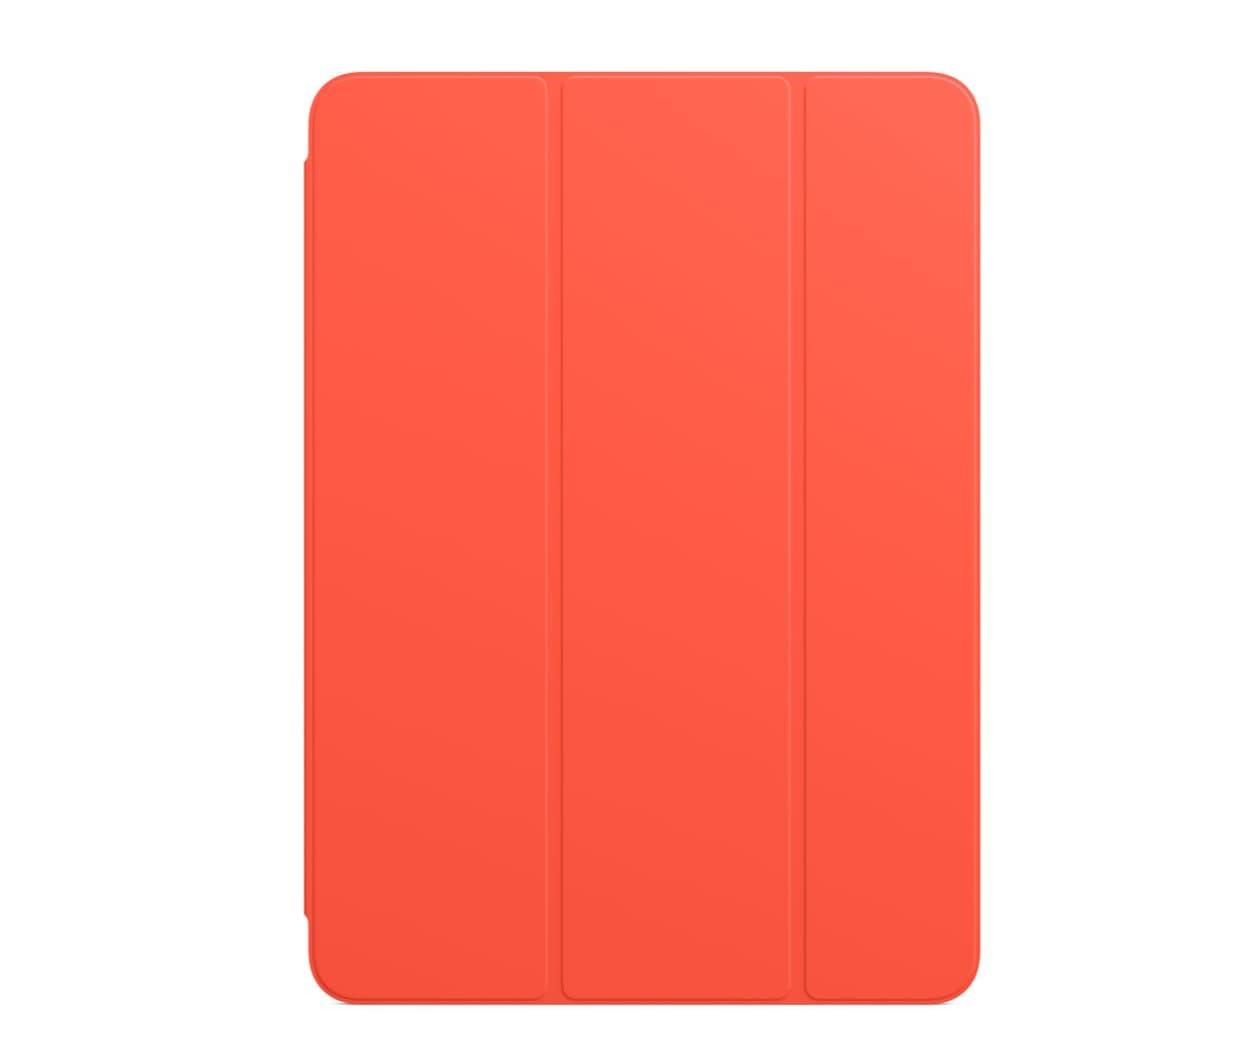 iPad 聰穎雙面夾相容對照表